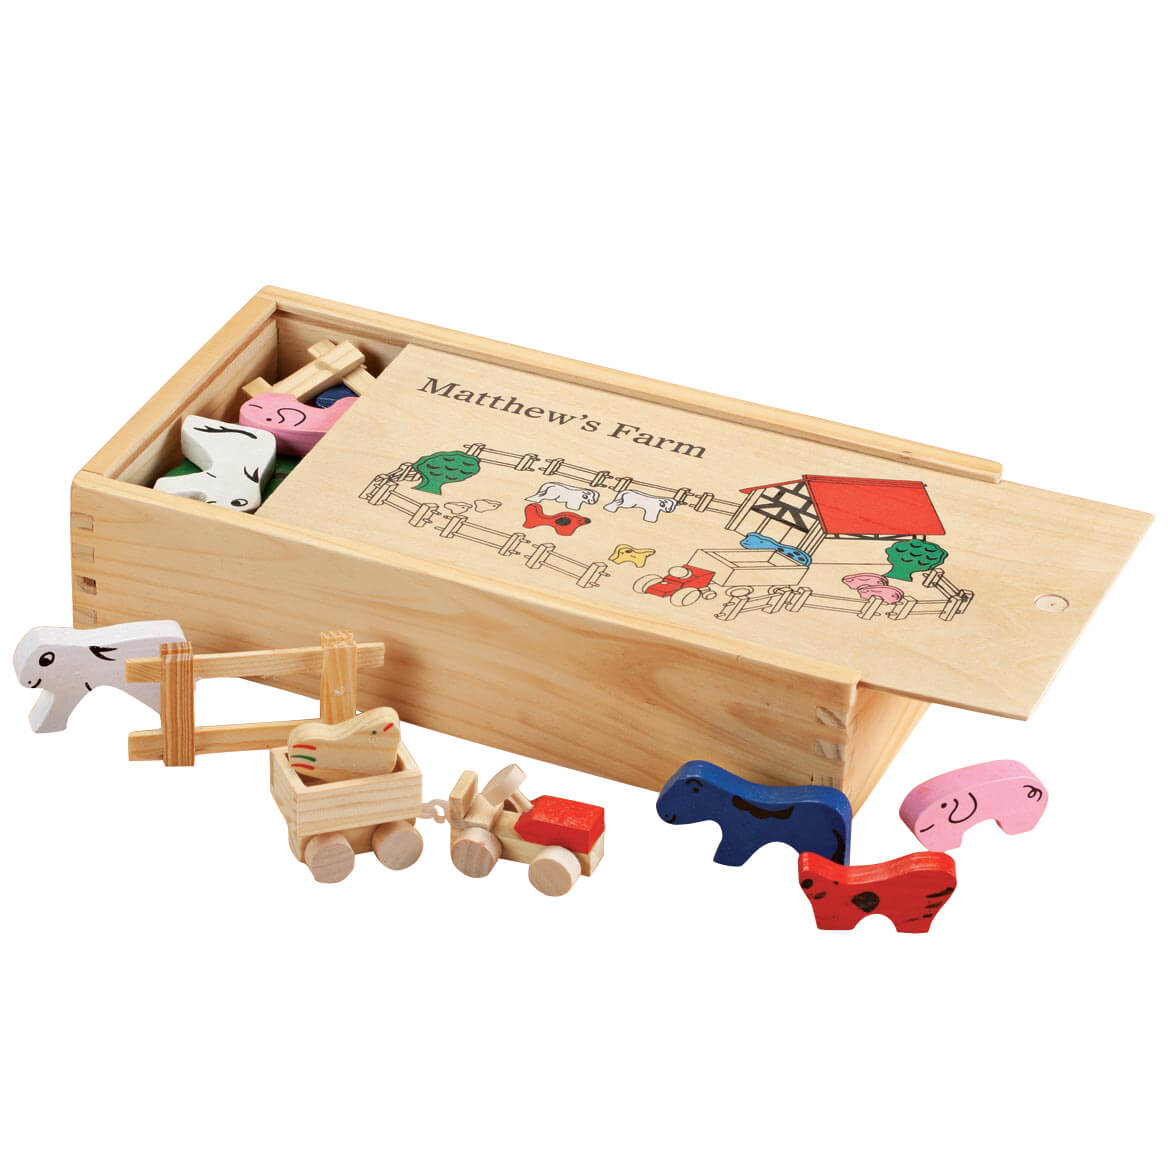 Personalized Children's Wooden Farm Set-358742